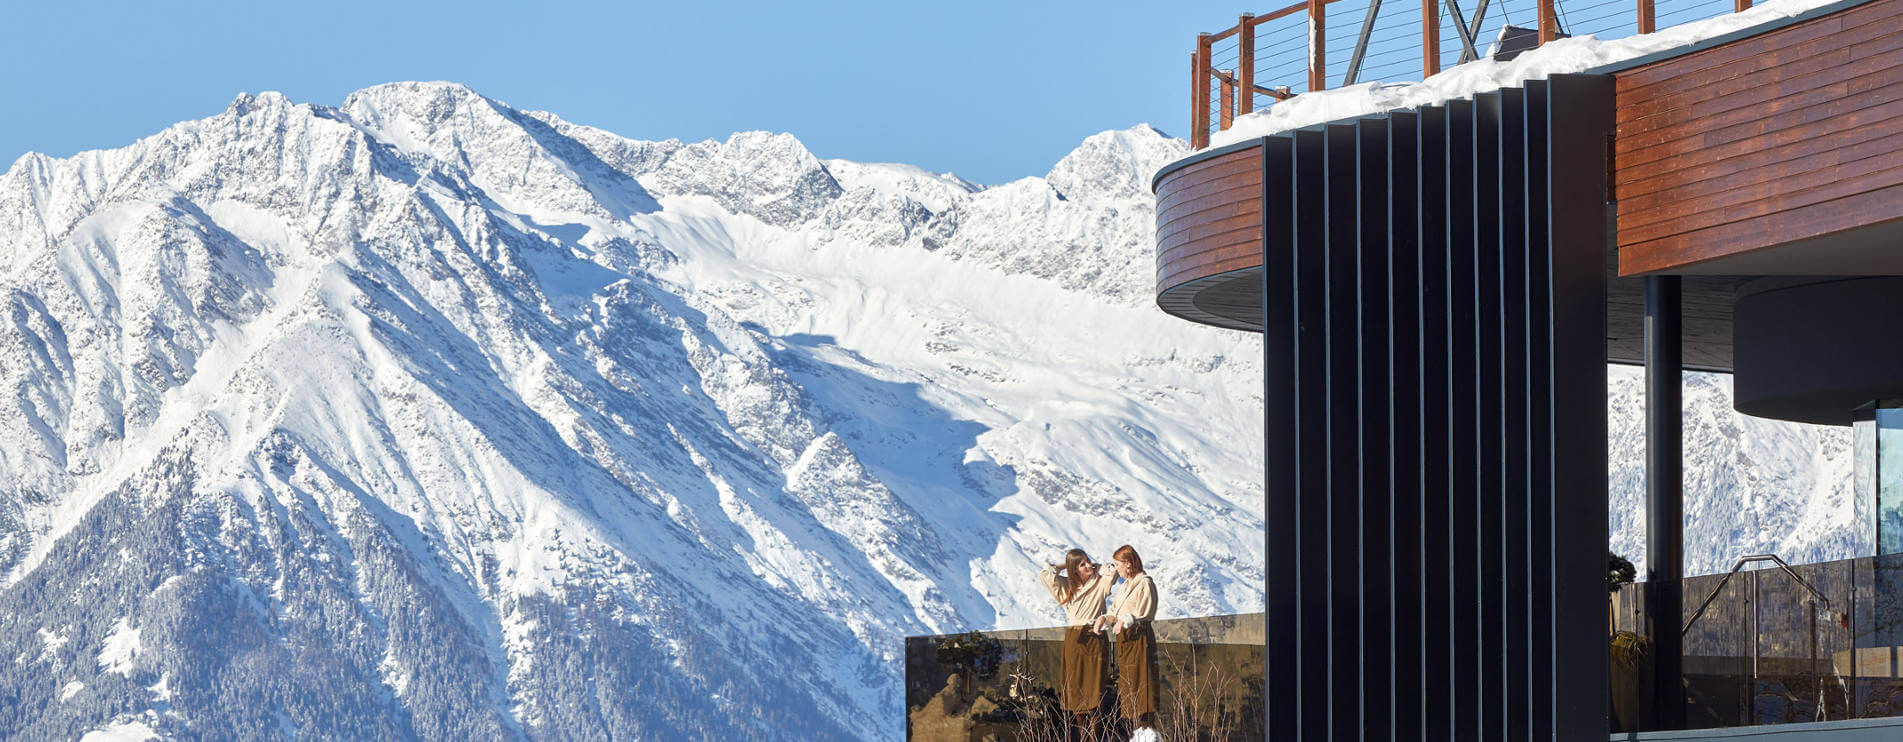 design hotel alpi 2 DESIGN HOTEL SULLE ALPI